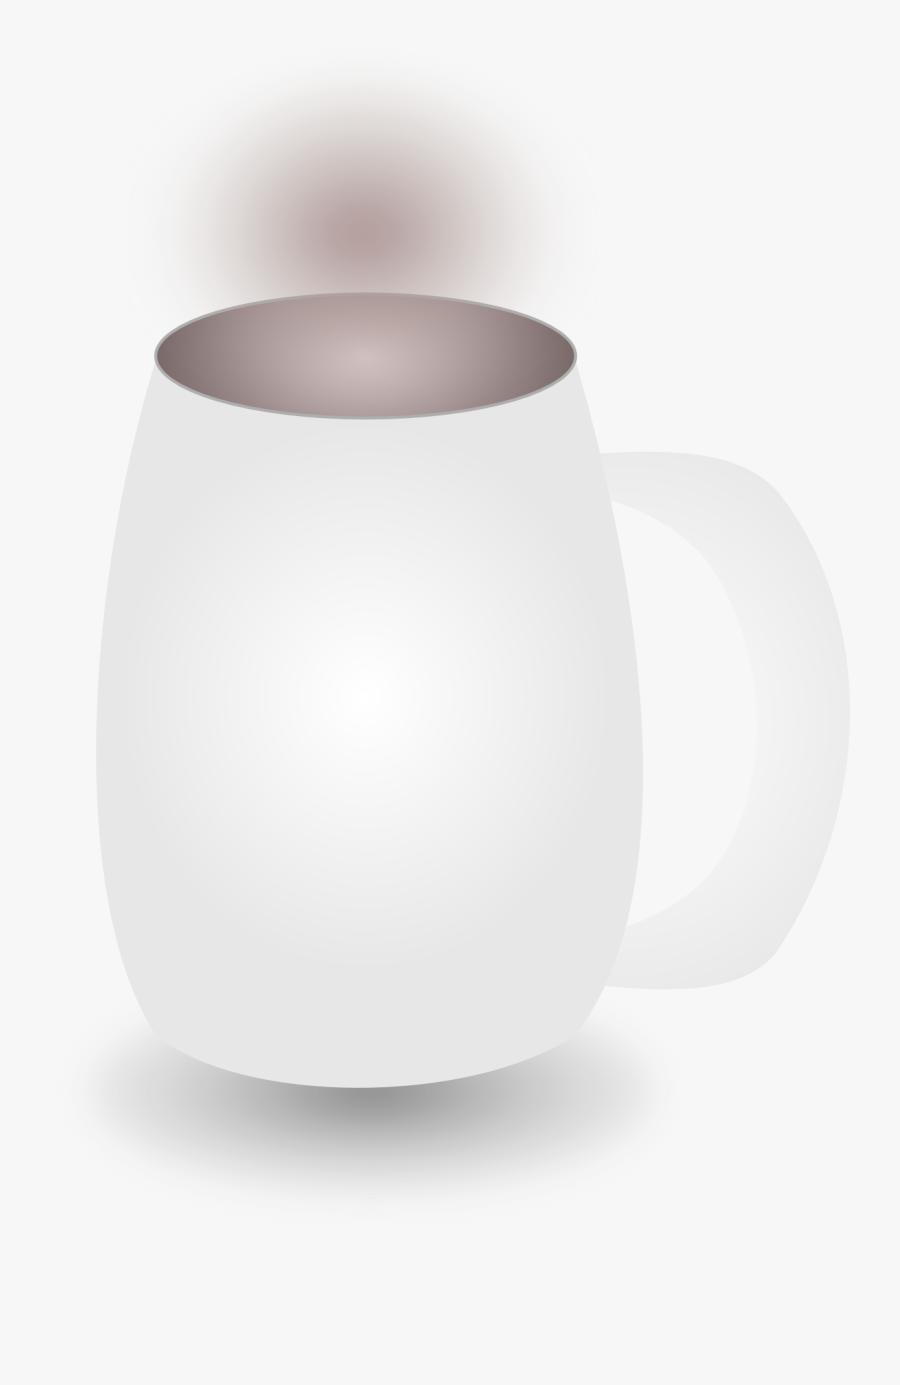 Cup,tableware,mug - Ceramic, Transparent Clipart